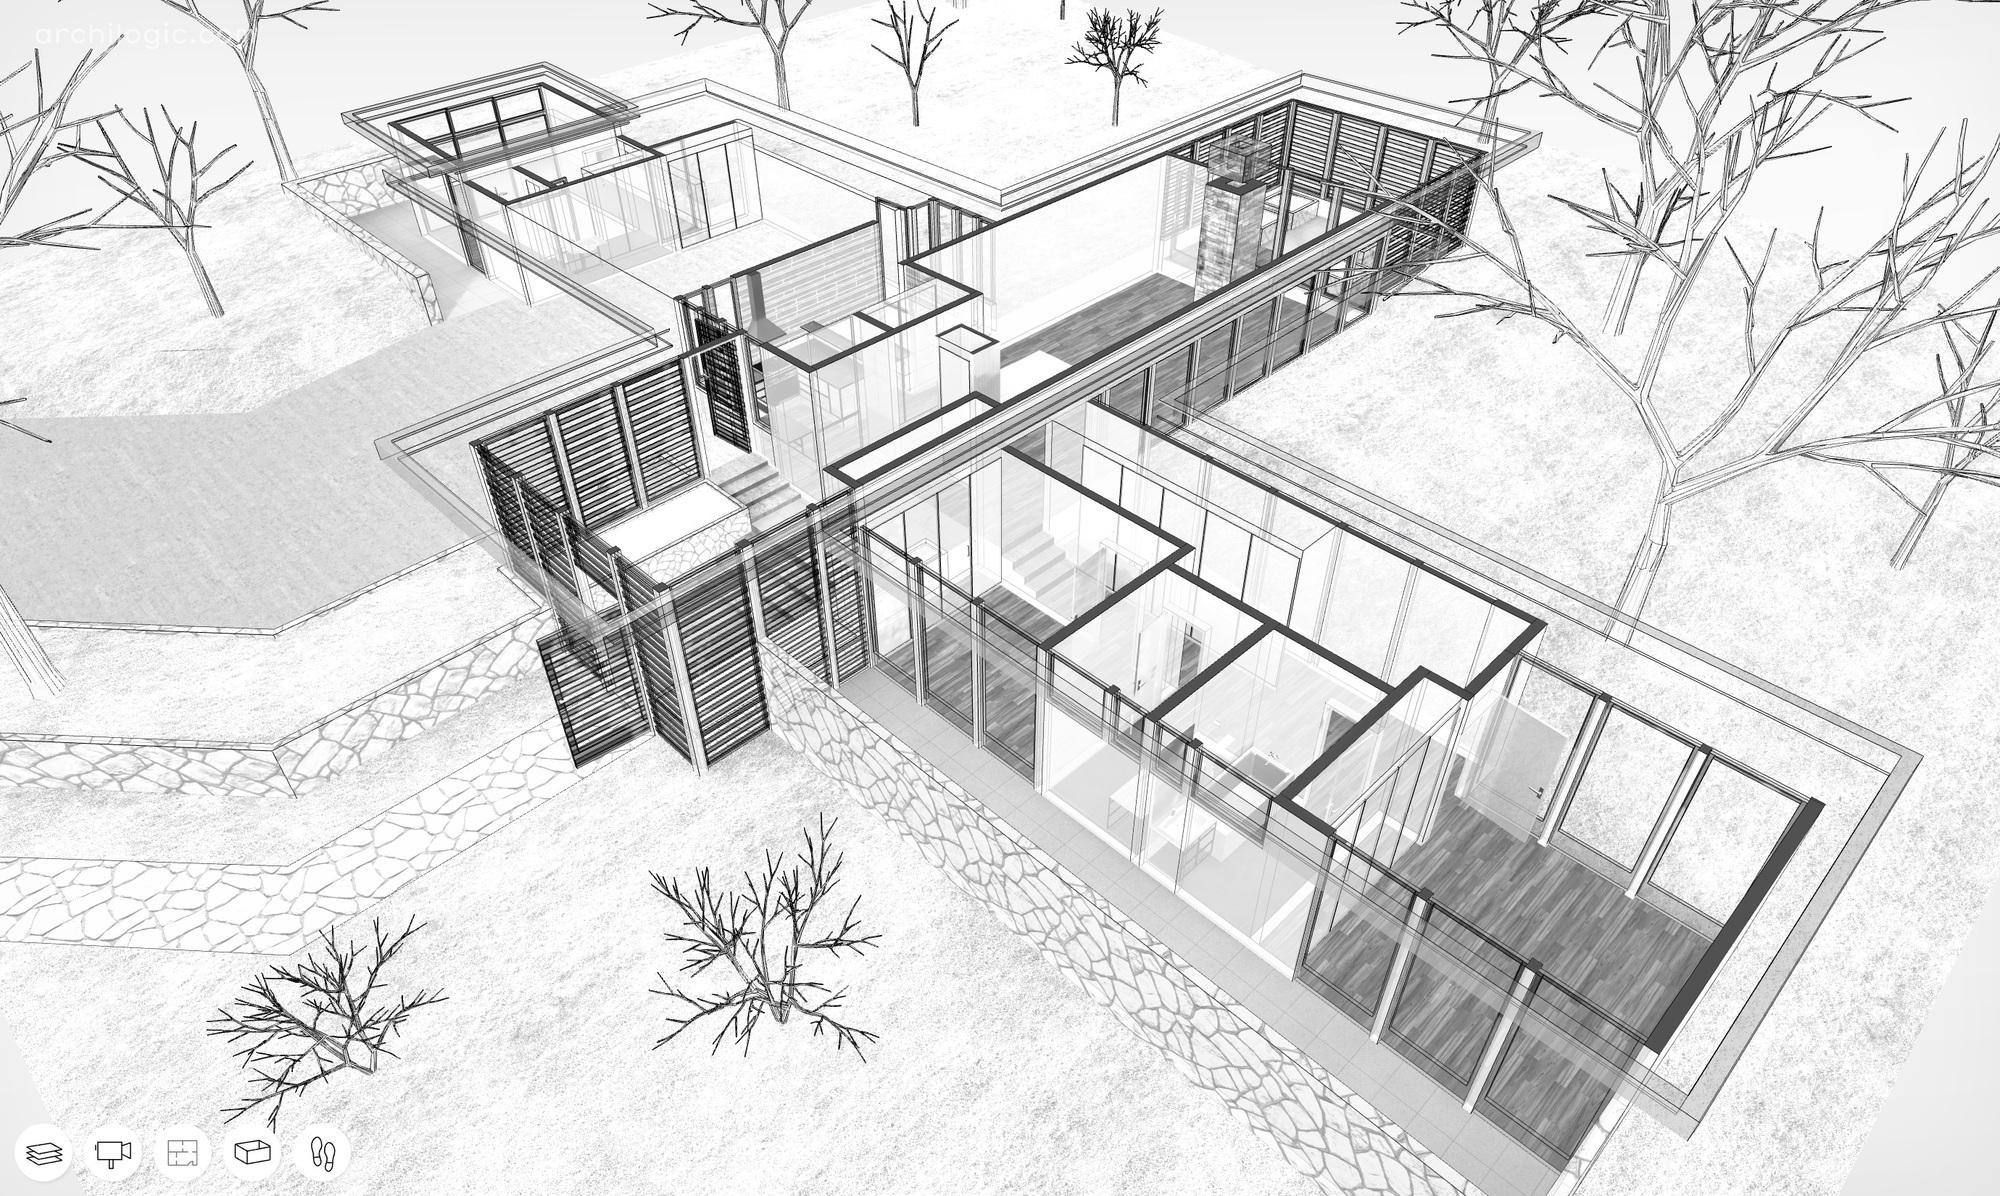 Drawn bulding  architecture design Smith study #12 Reality R